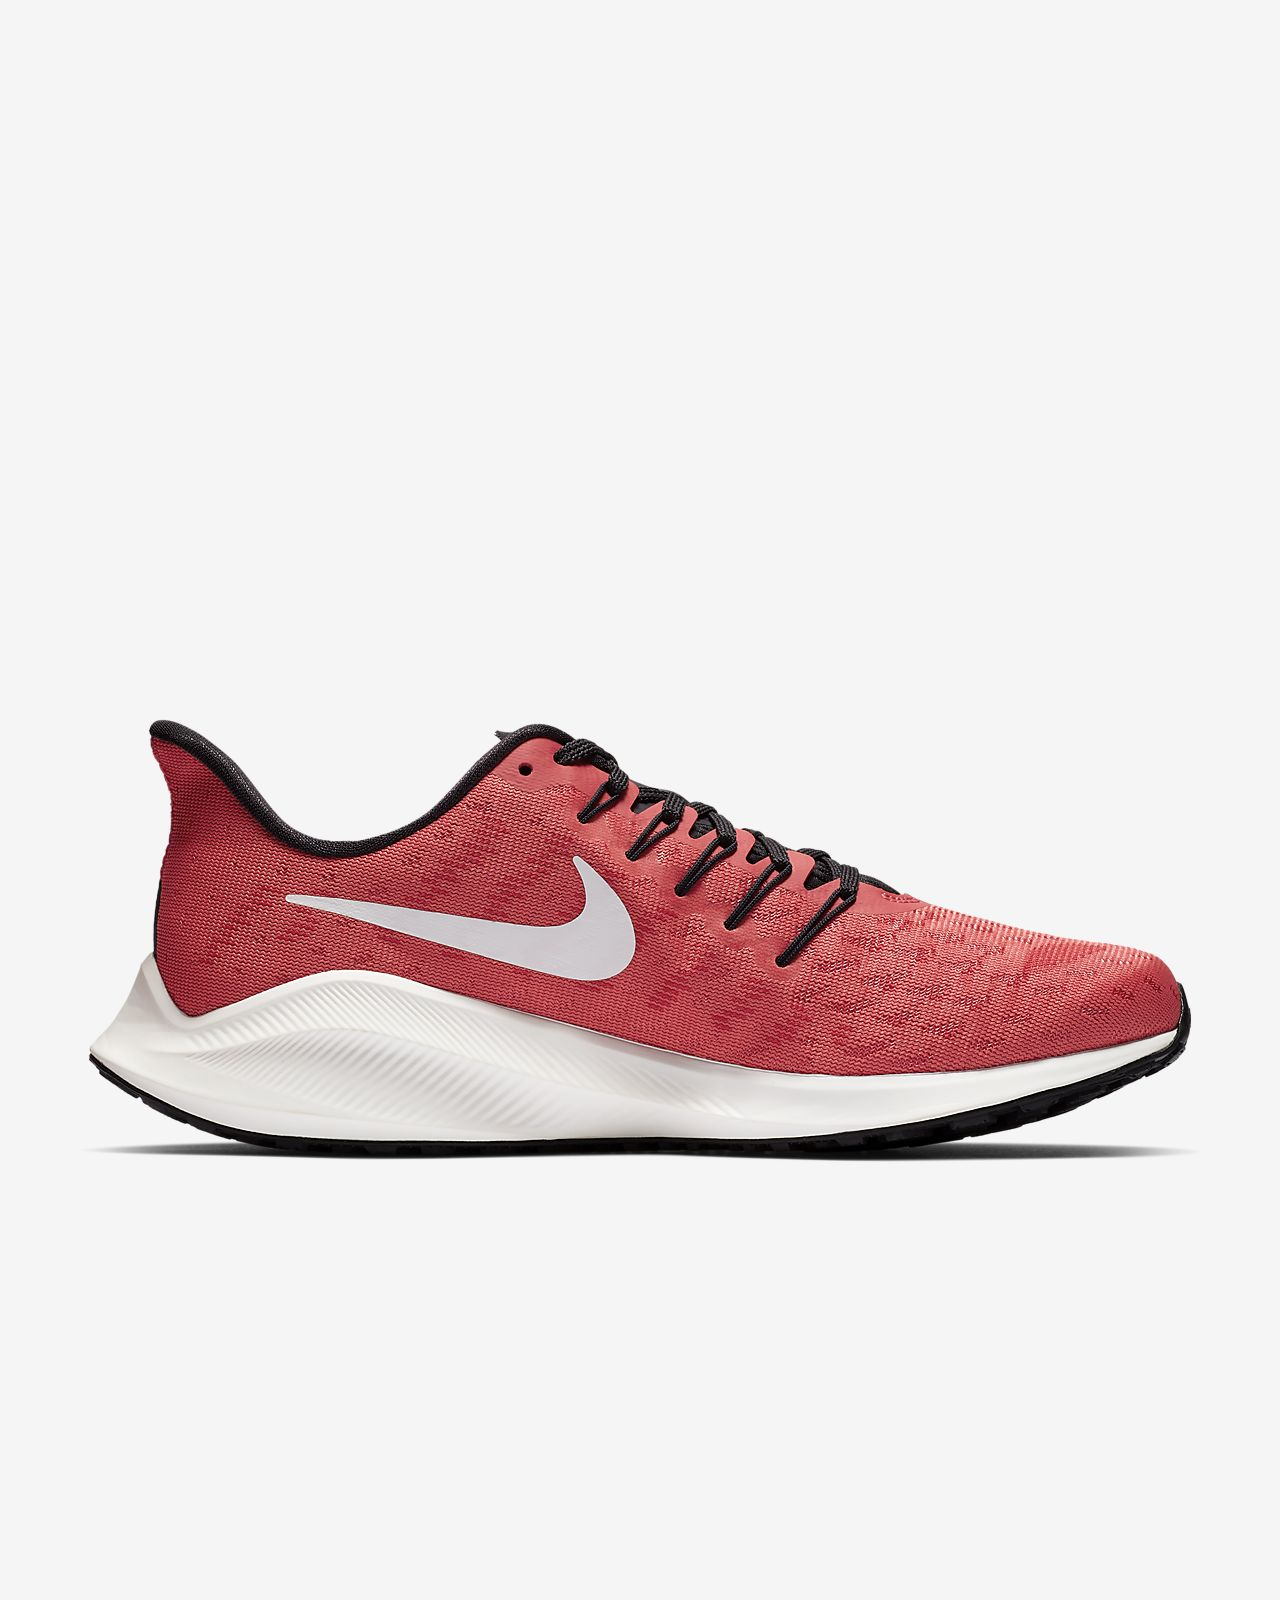 97f52ef30f8f Nike Air Zoom Vomero 14 Women s Running Shoe. Nike.com